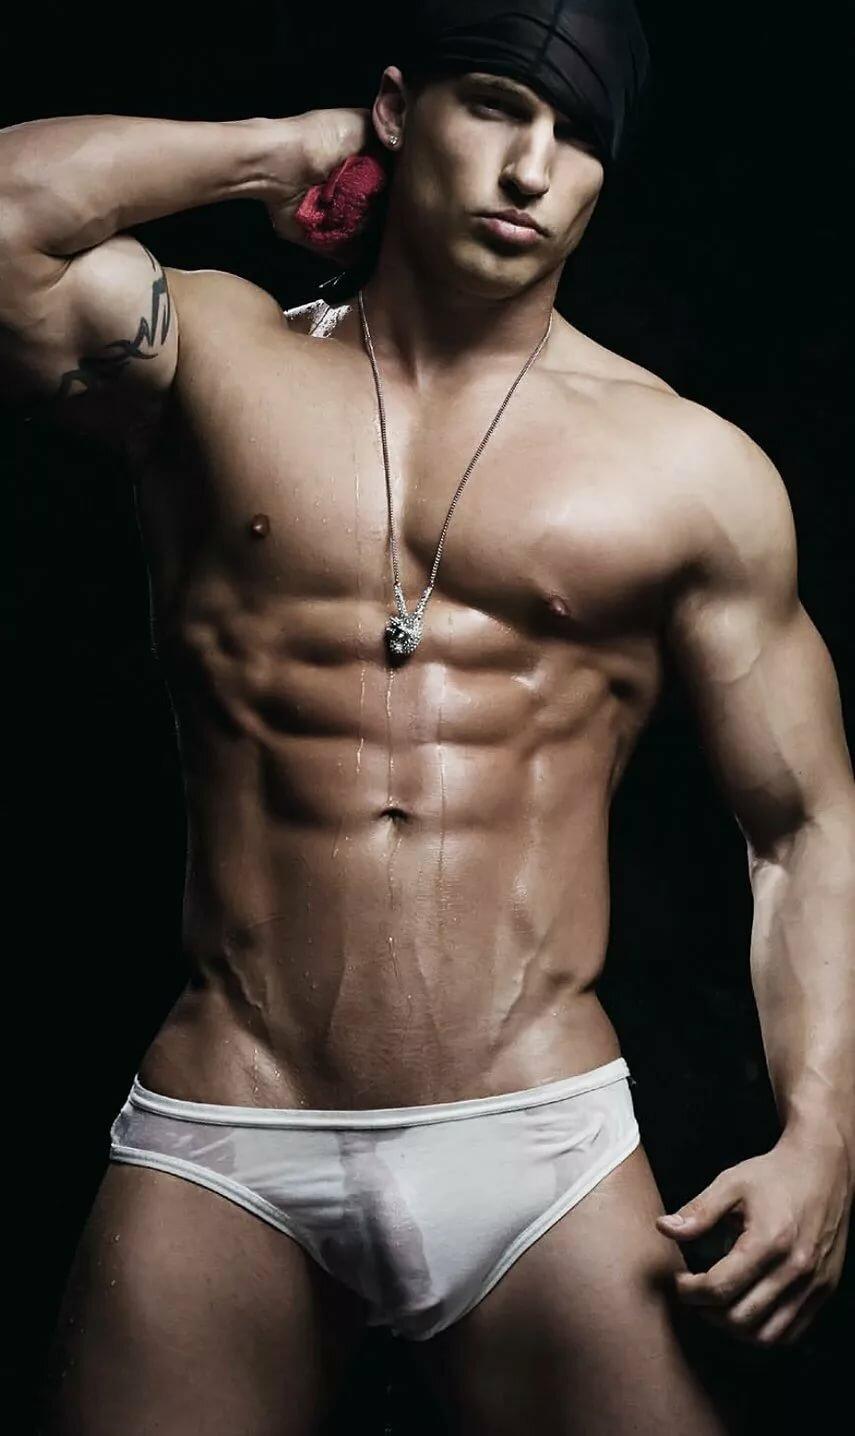 Naked strippers models hot men, hot indian erotic babes